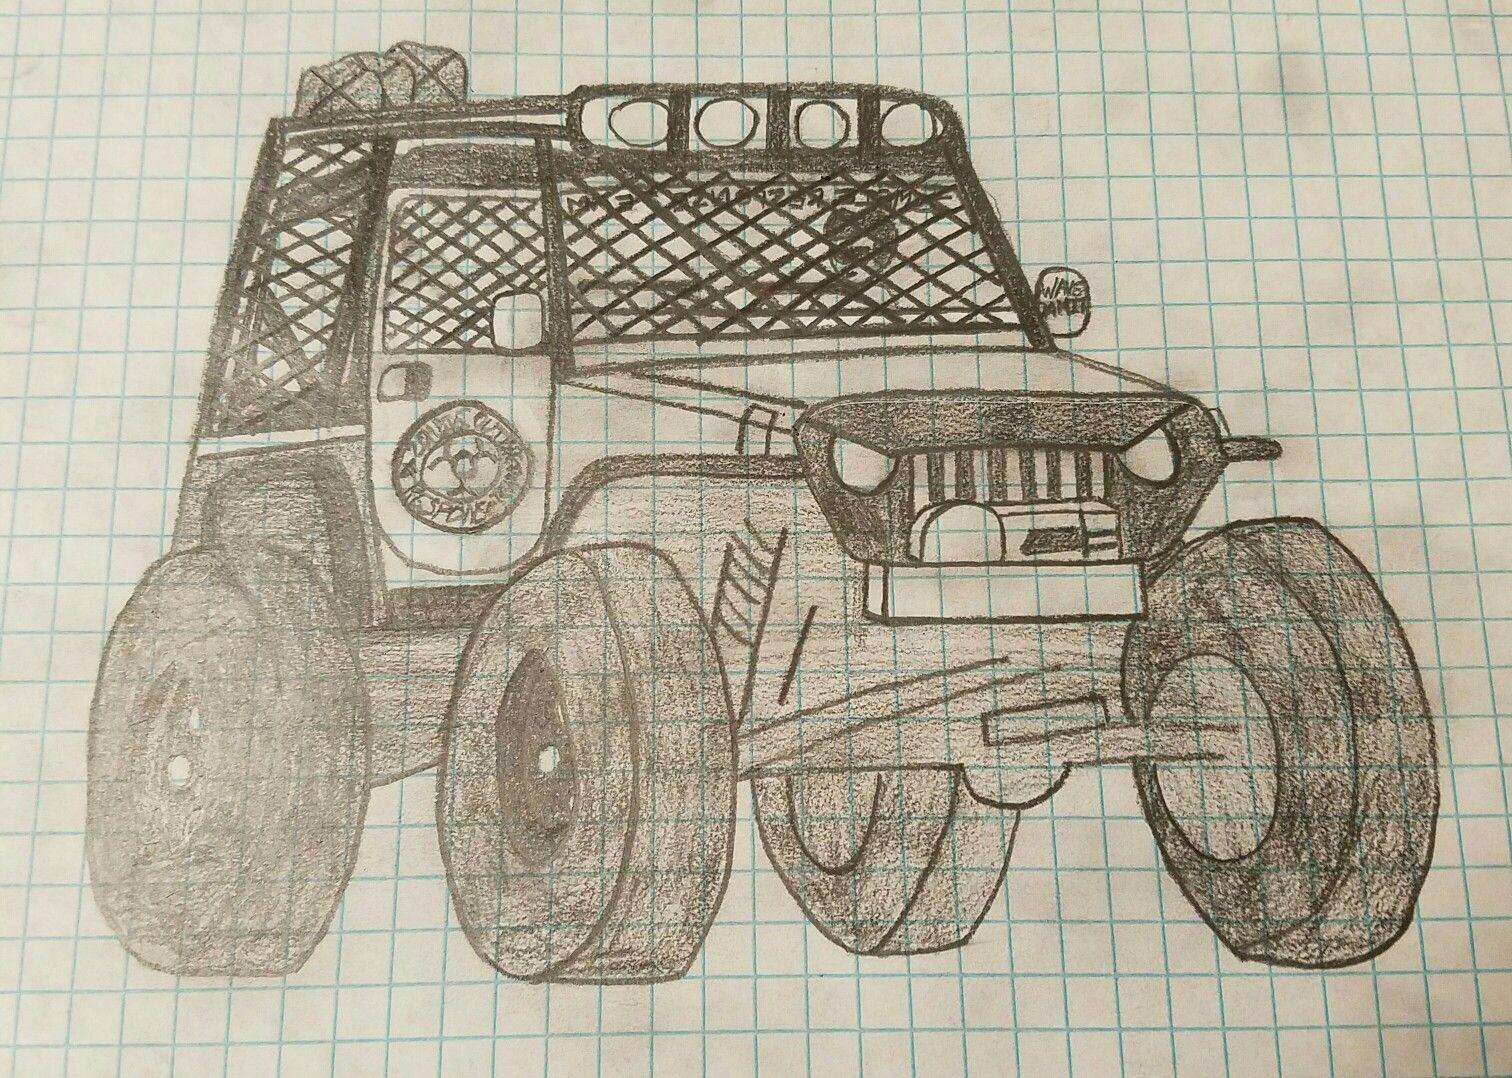 Zombie Apocalypse Response Team Jeep Wrangler Tj Drawn By Me Pimped Red Rubicon Boats